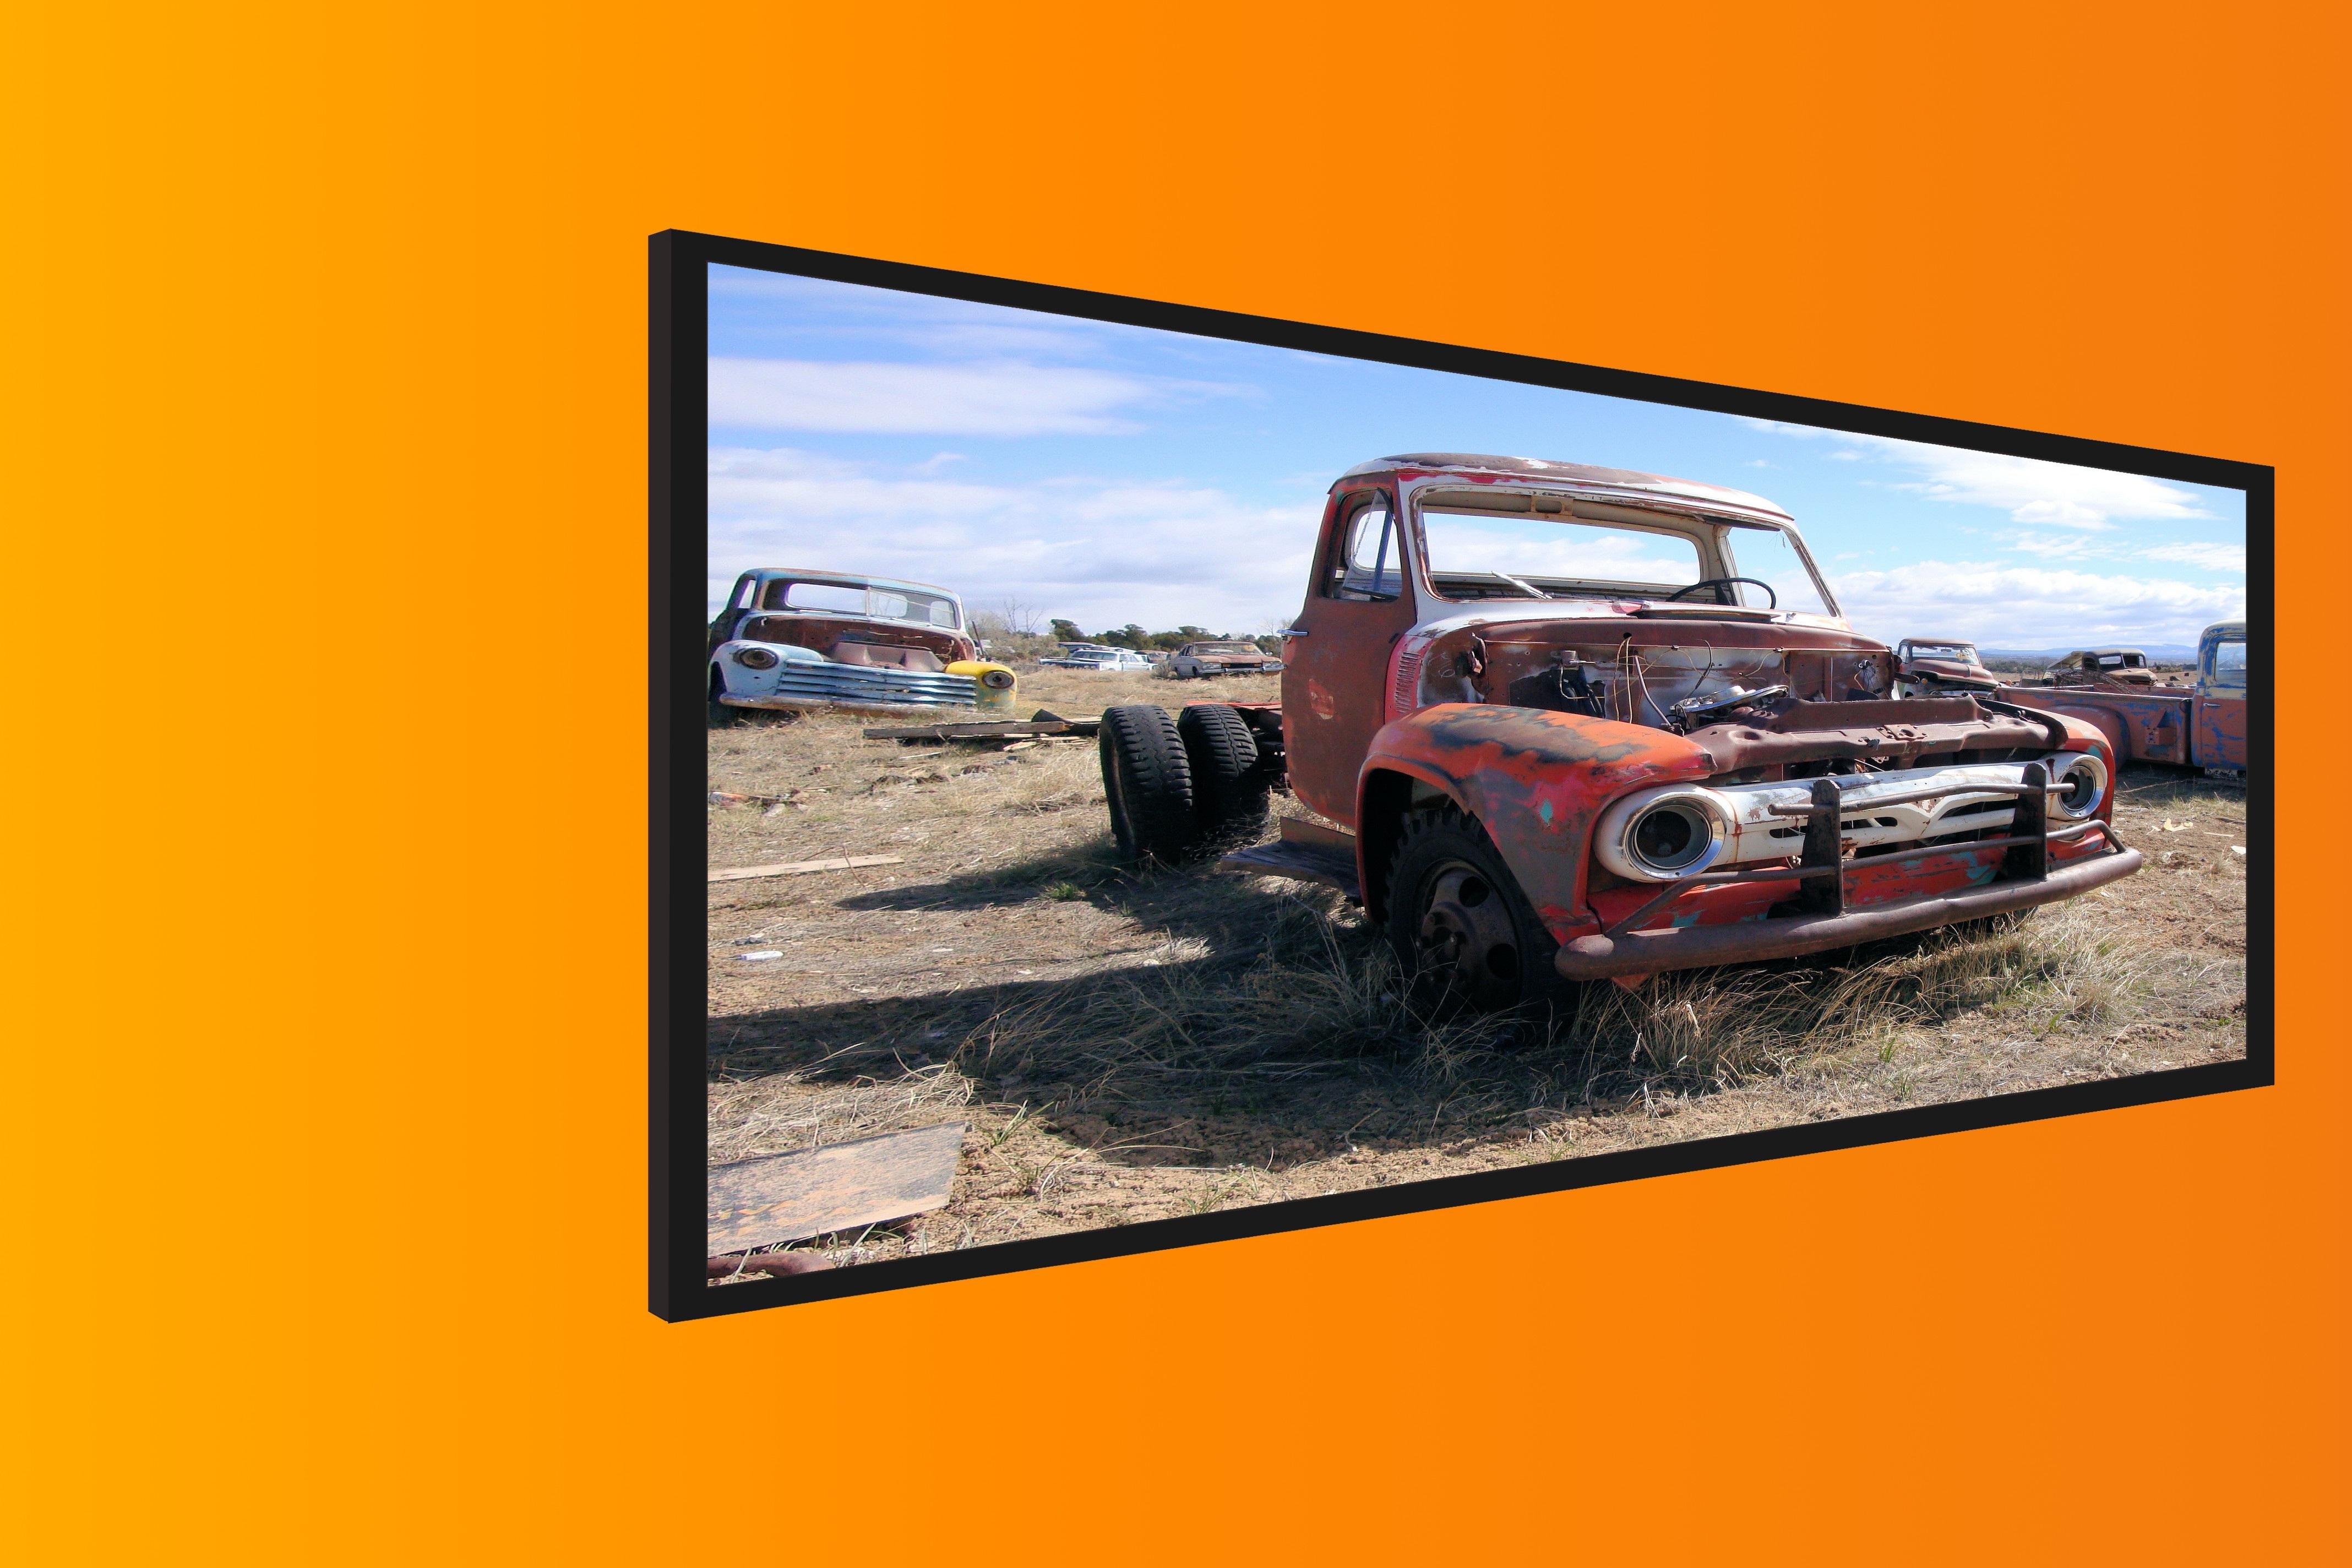 Kostenlose foto : Perspektive, Mauer, Fahrzeug, Rahmen, Material ...